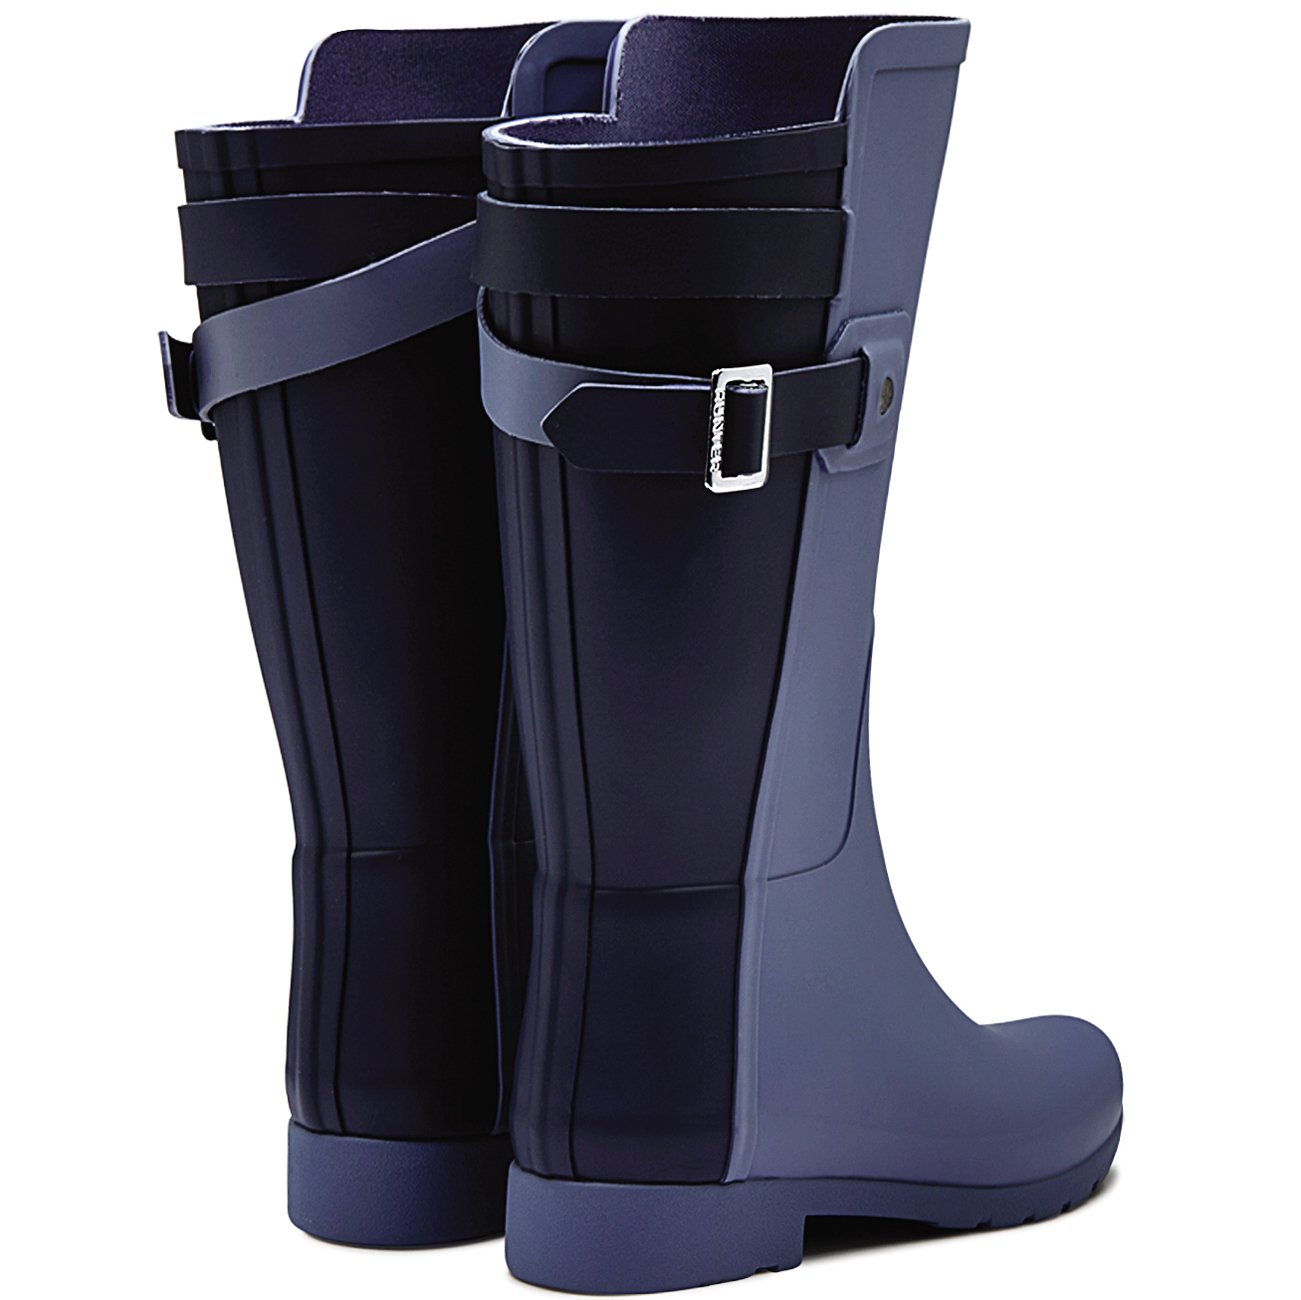 Womens Hunter Original Refined Back Strap Short Wellingtons Winter Boots B015SJCIH0 9 B(M) US Mineral Blue/Midnight